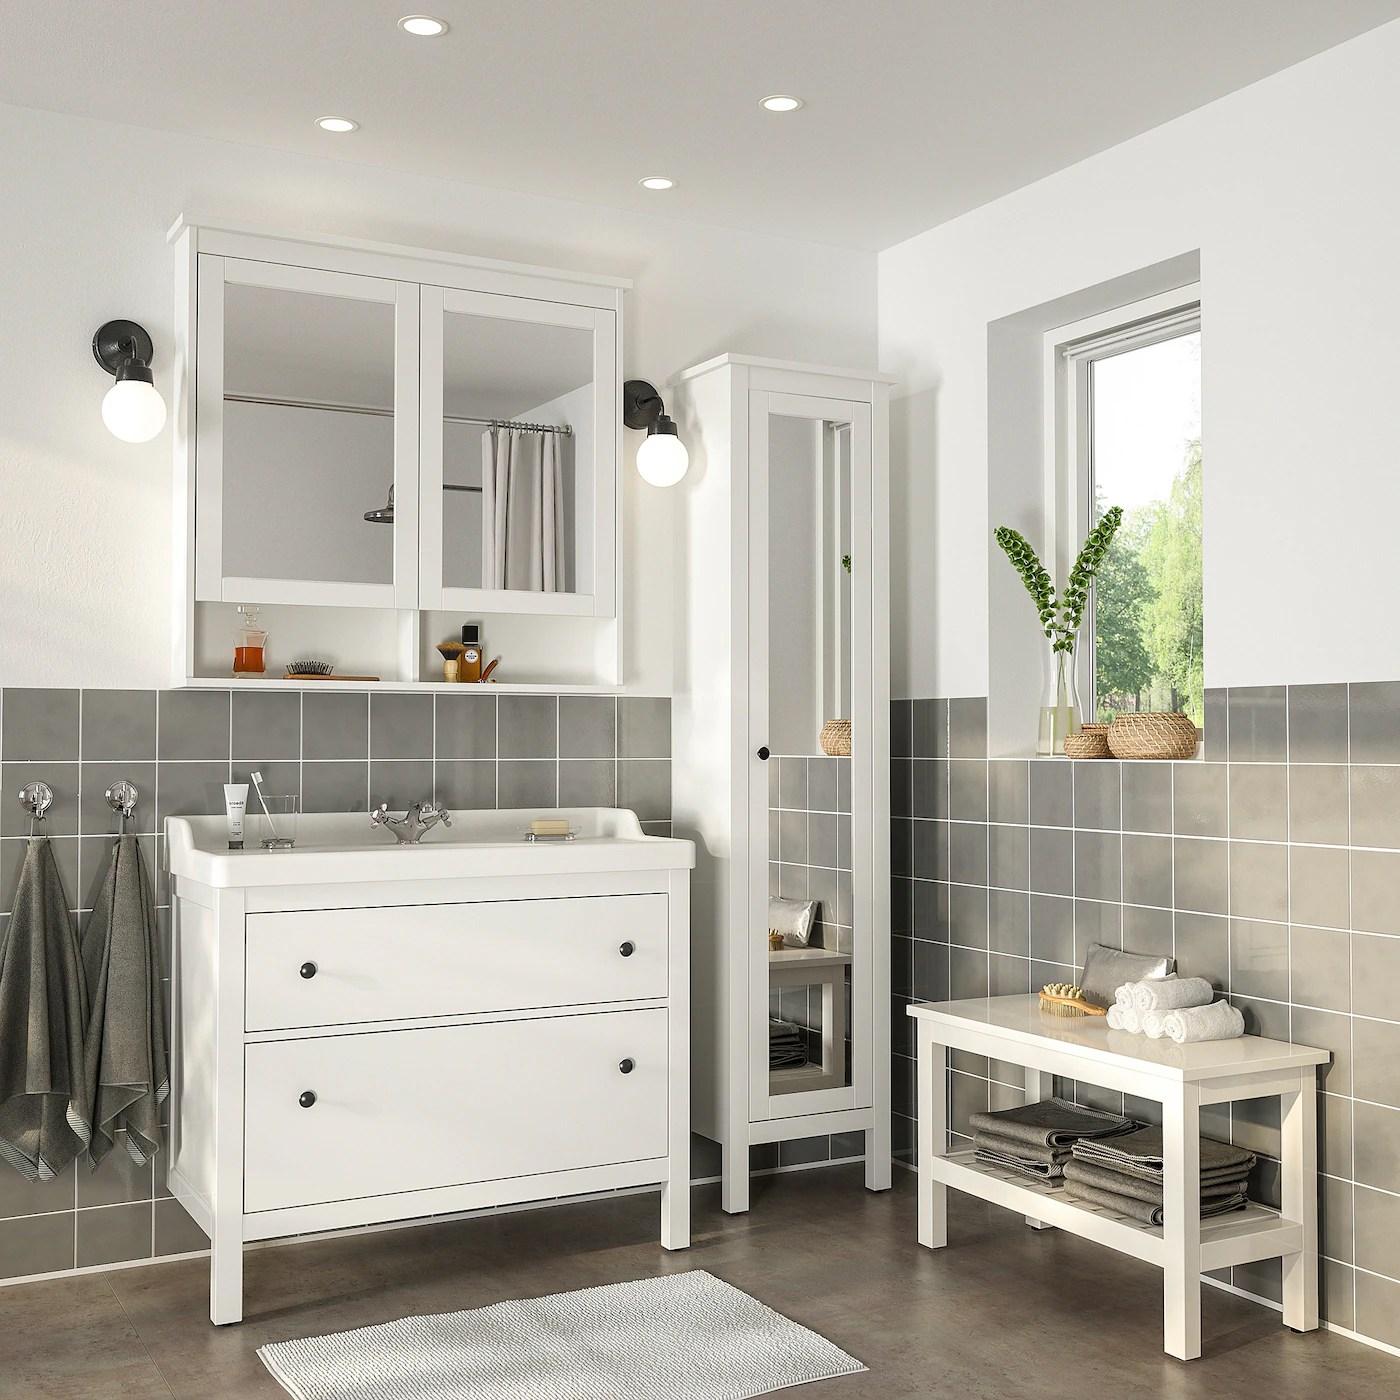 Decouvrez Hemnes Rattviken Mobilier Salle De Bain 5 Pieces Blanc Runskar Mitigeur Lavabo Ikea Ikea